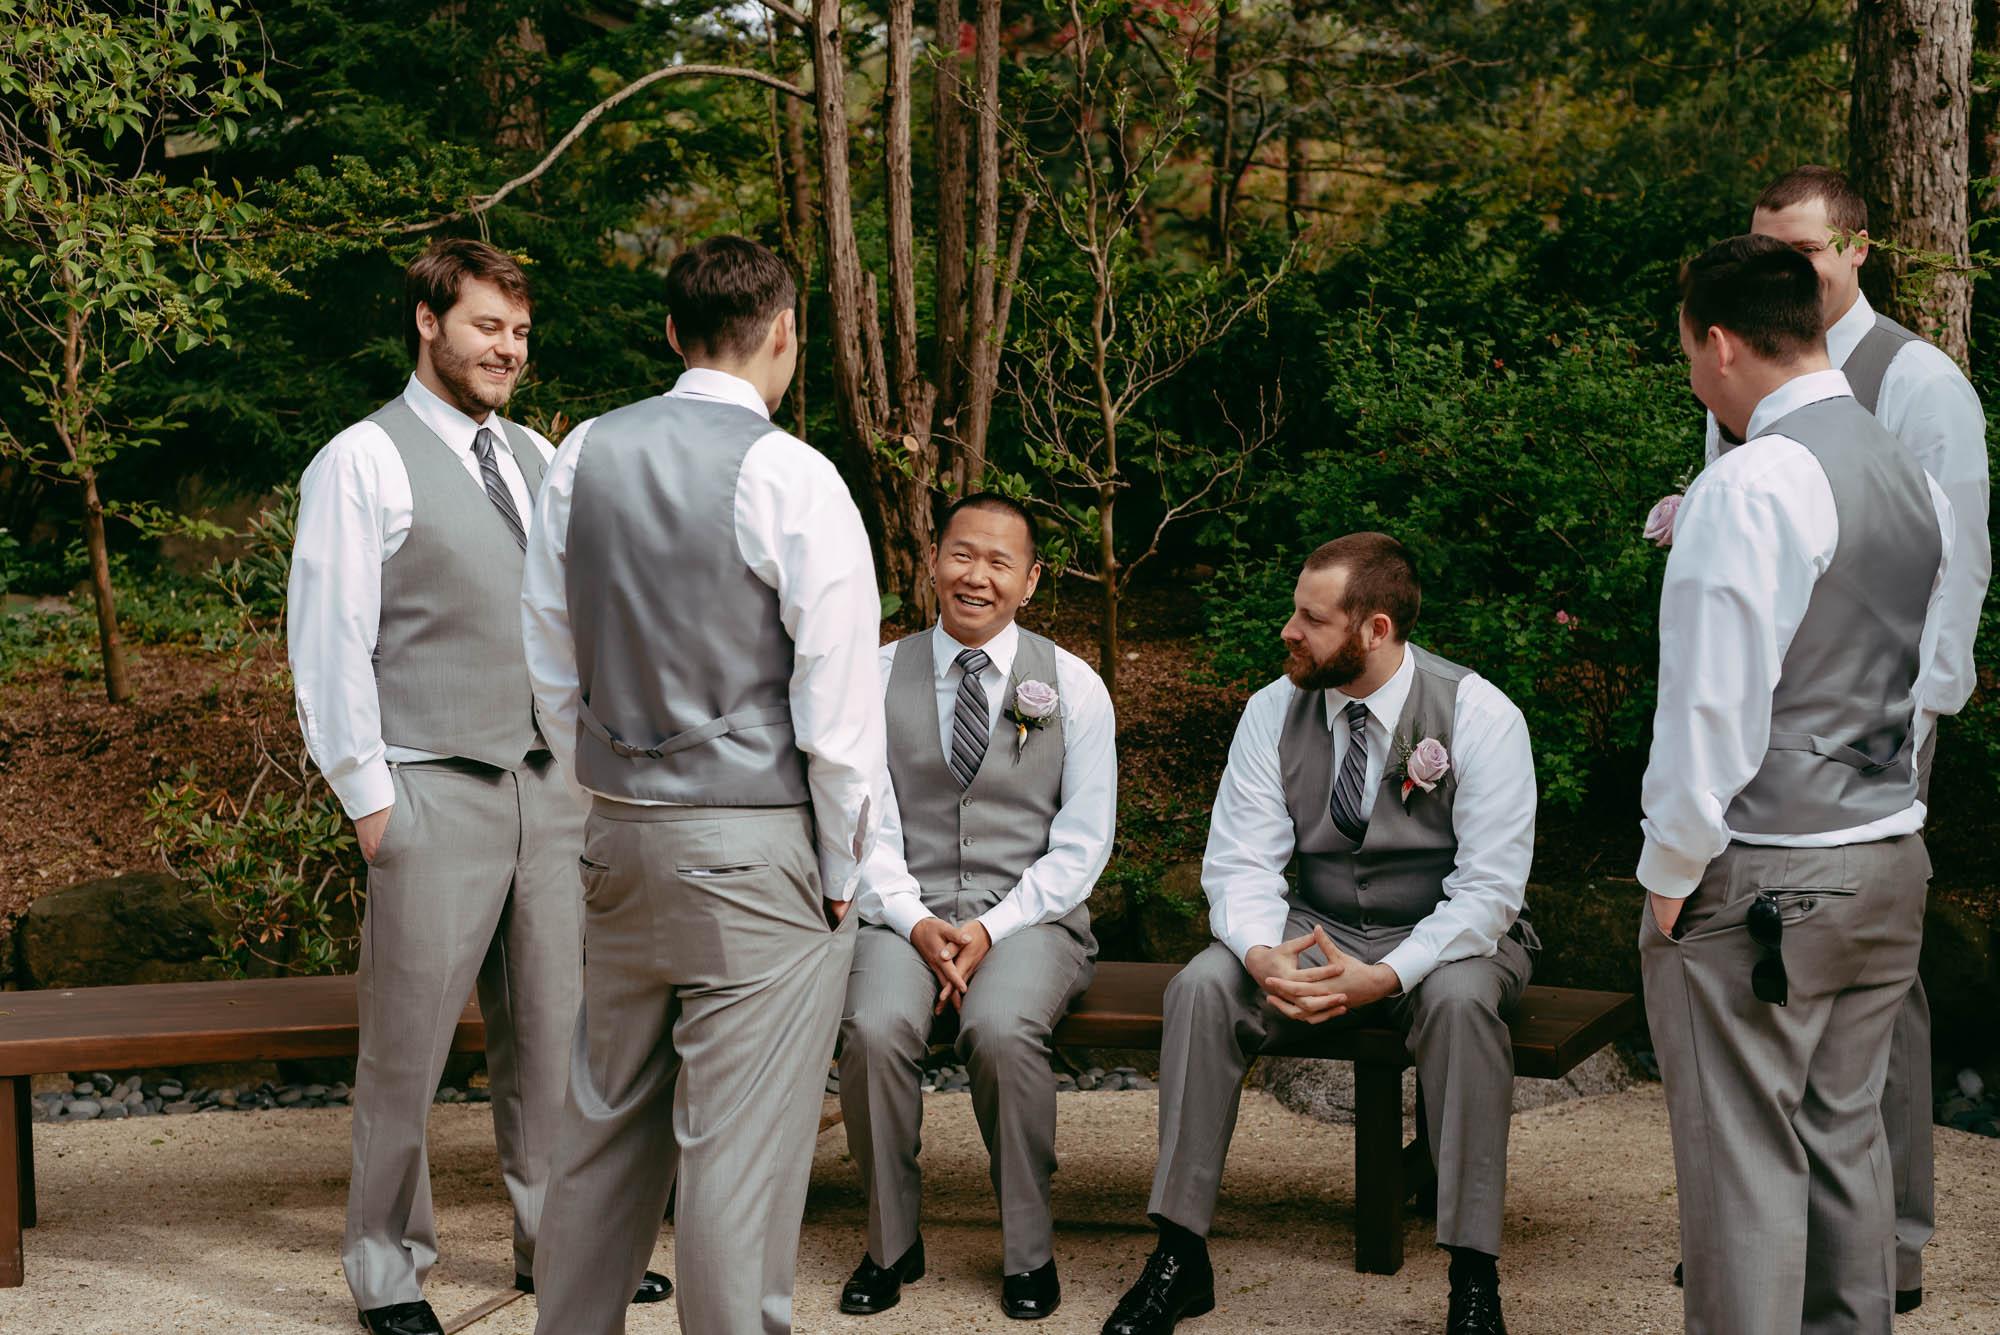 prairie-street-brewhouse-wedding-Rockford-IL-wedding-photographers-168.jpg